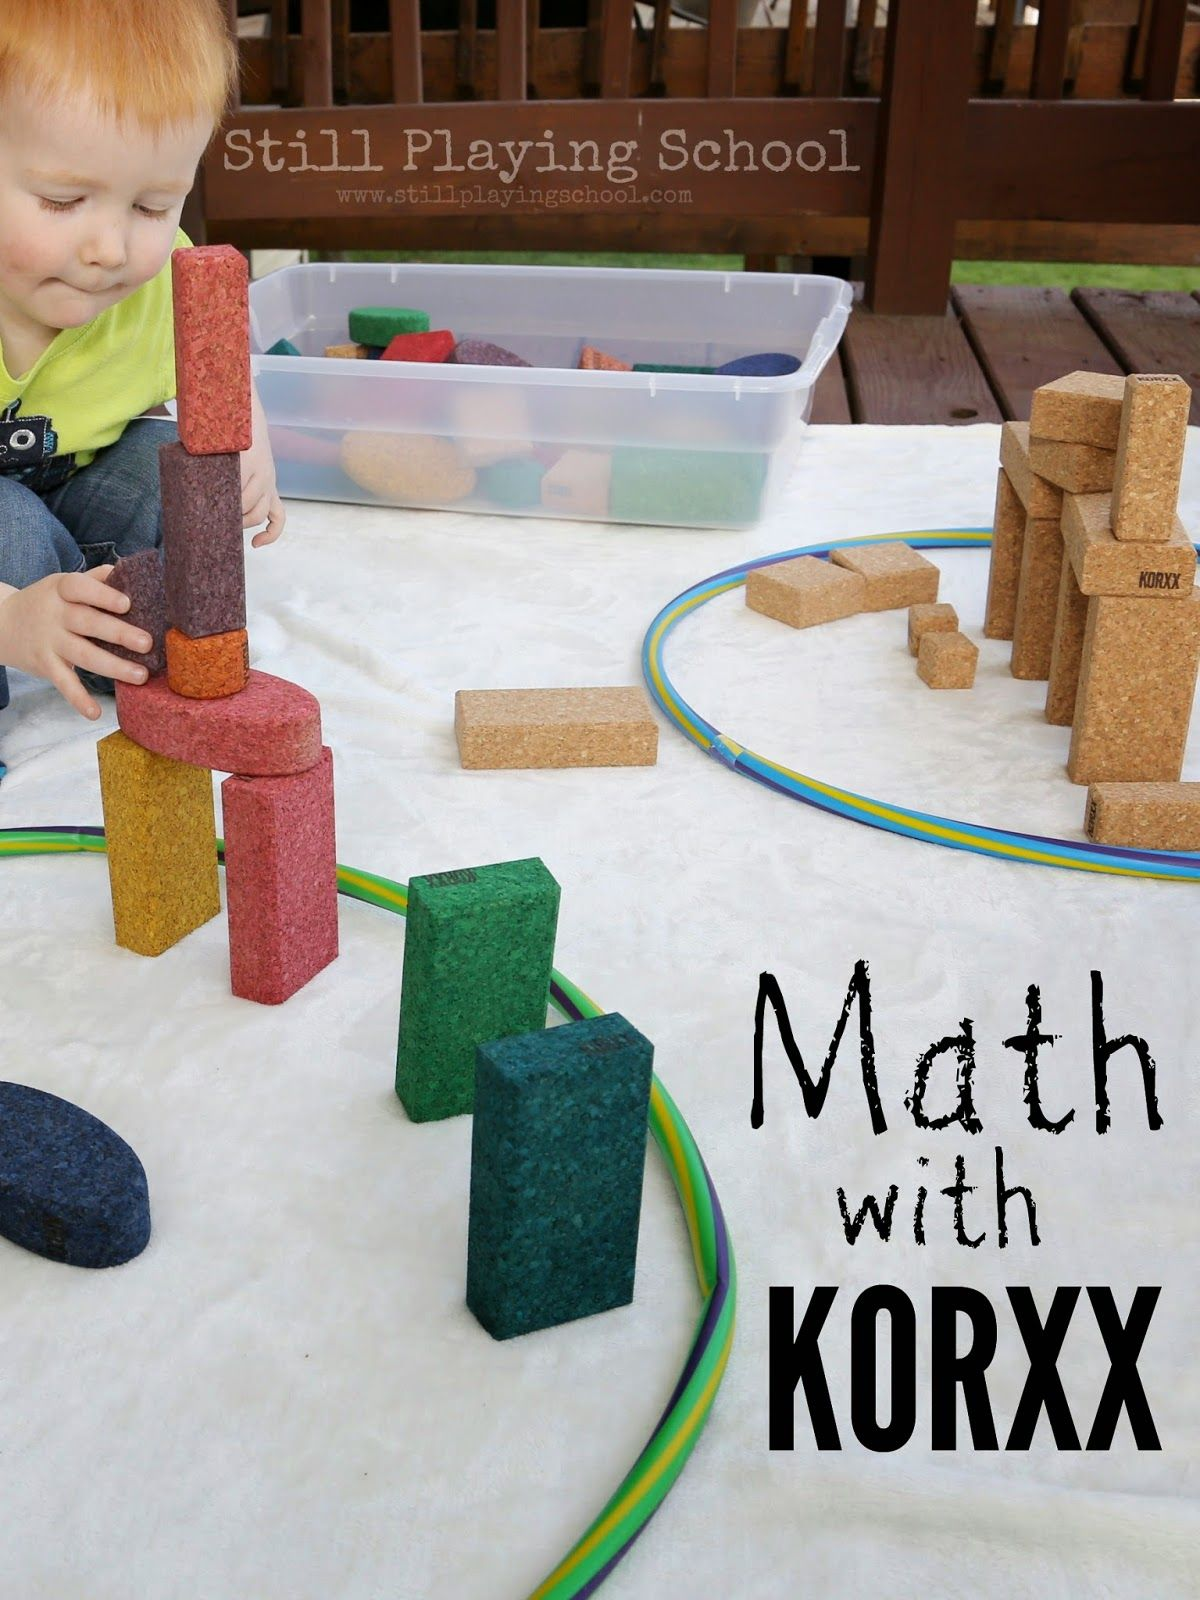 Math With Korxx Sorting Cork Blocks By Attributes